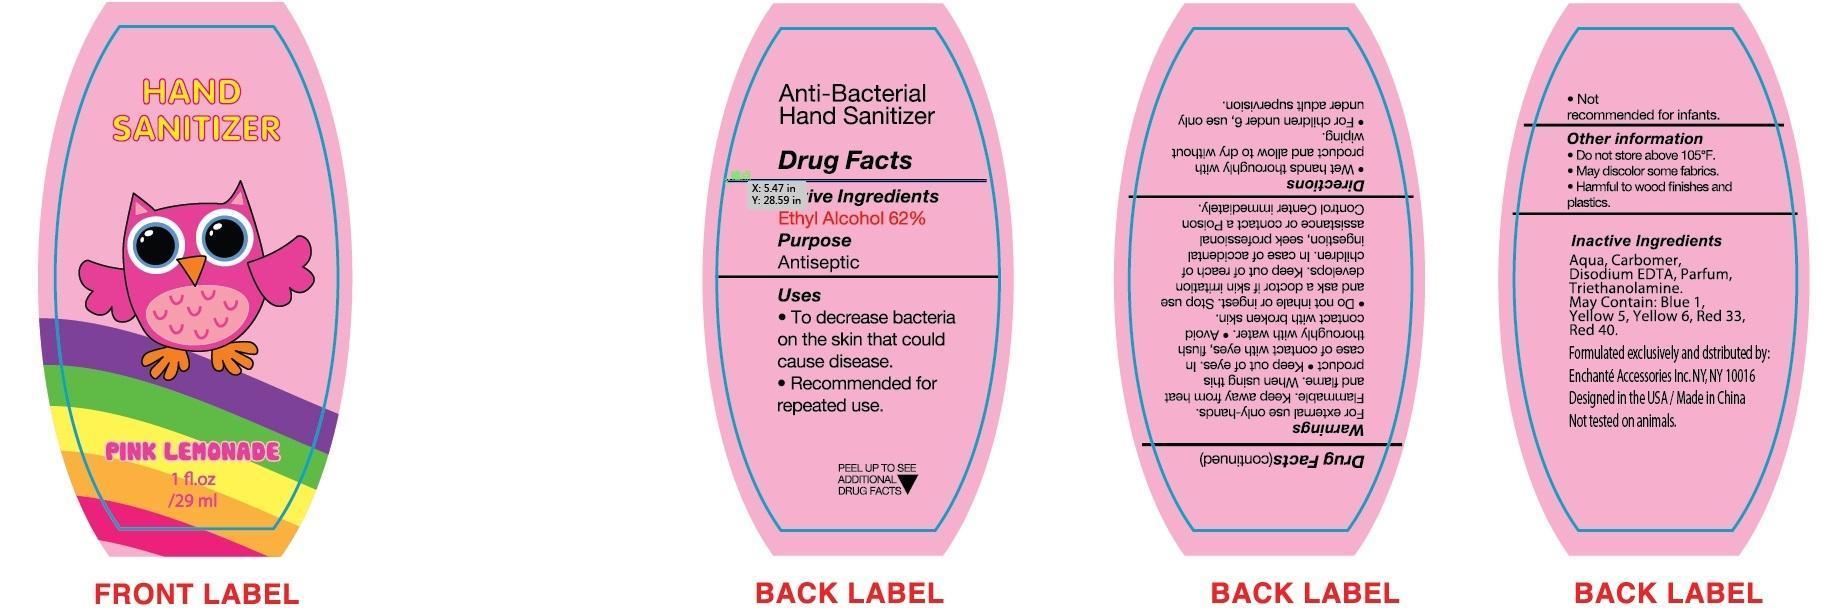 Pink Lemonade Hand Sanitizer (Alcohol) Liquid [Enchante Accessories Inc. ]